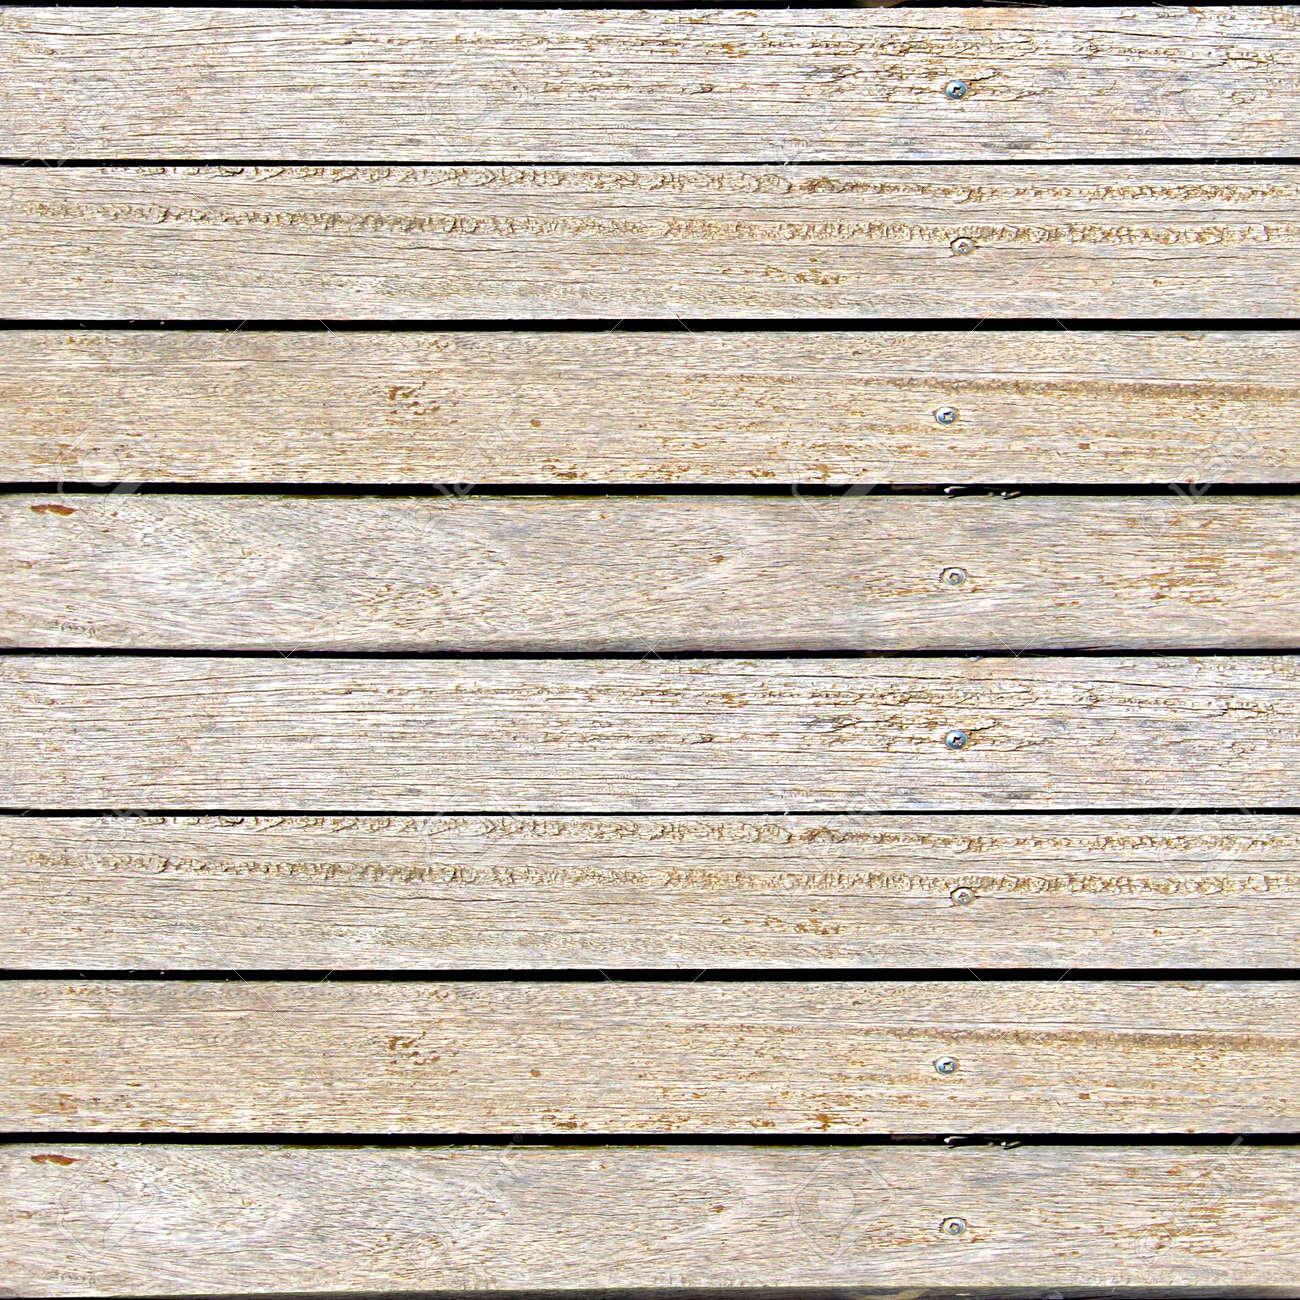 baldosa de madera de la cubierta de textura perfecta foto de archivo